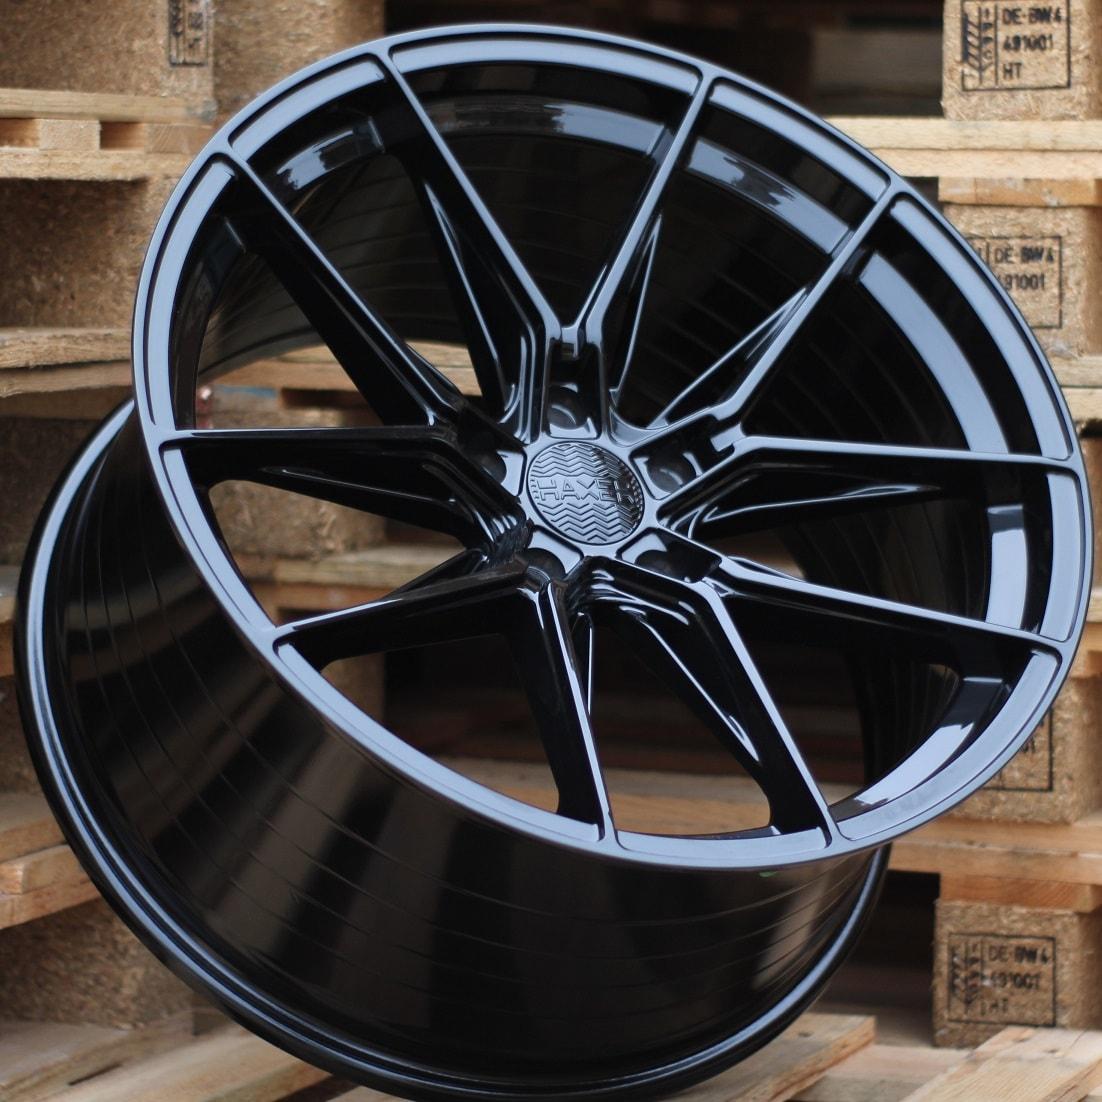 DISKI Haxer 5×108 R19 (Black)